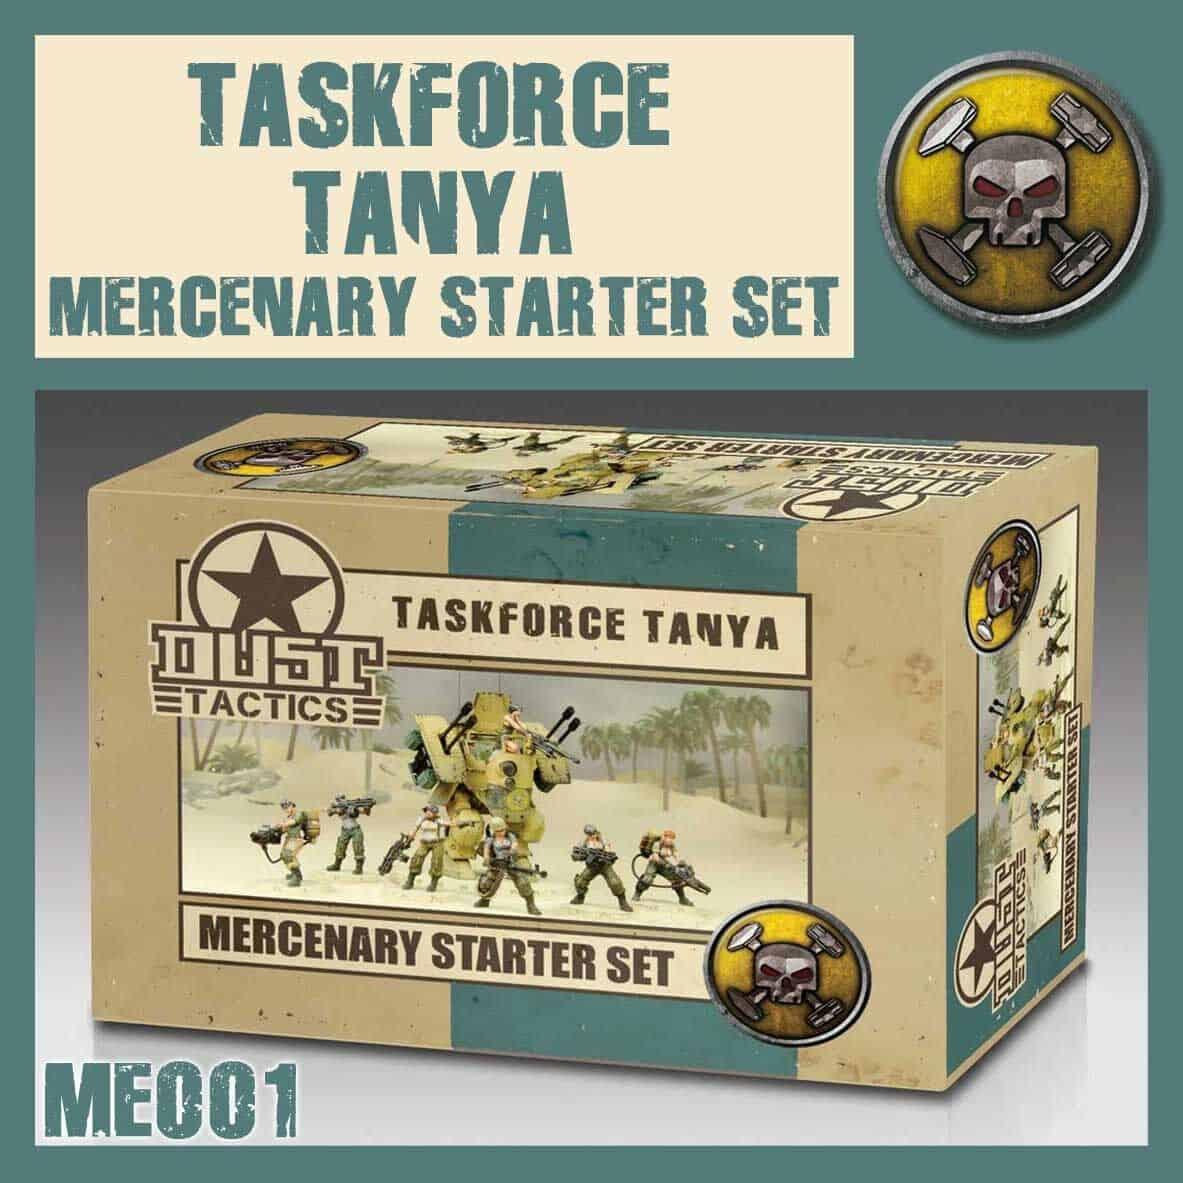 Taskforce Tanya